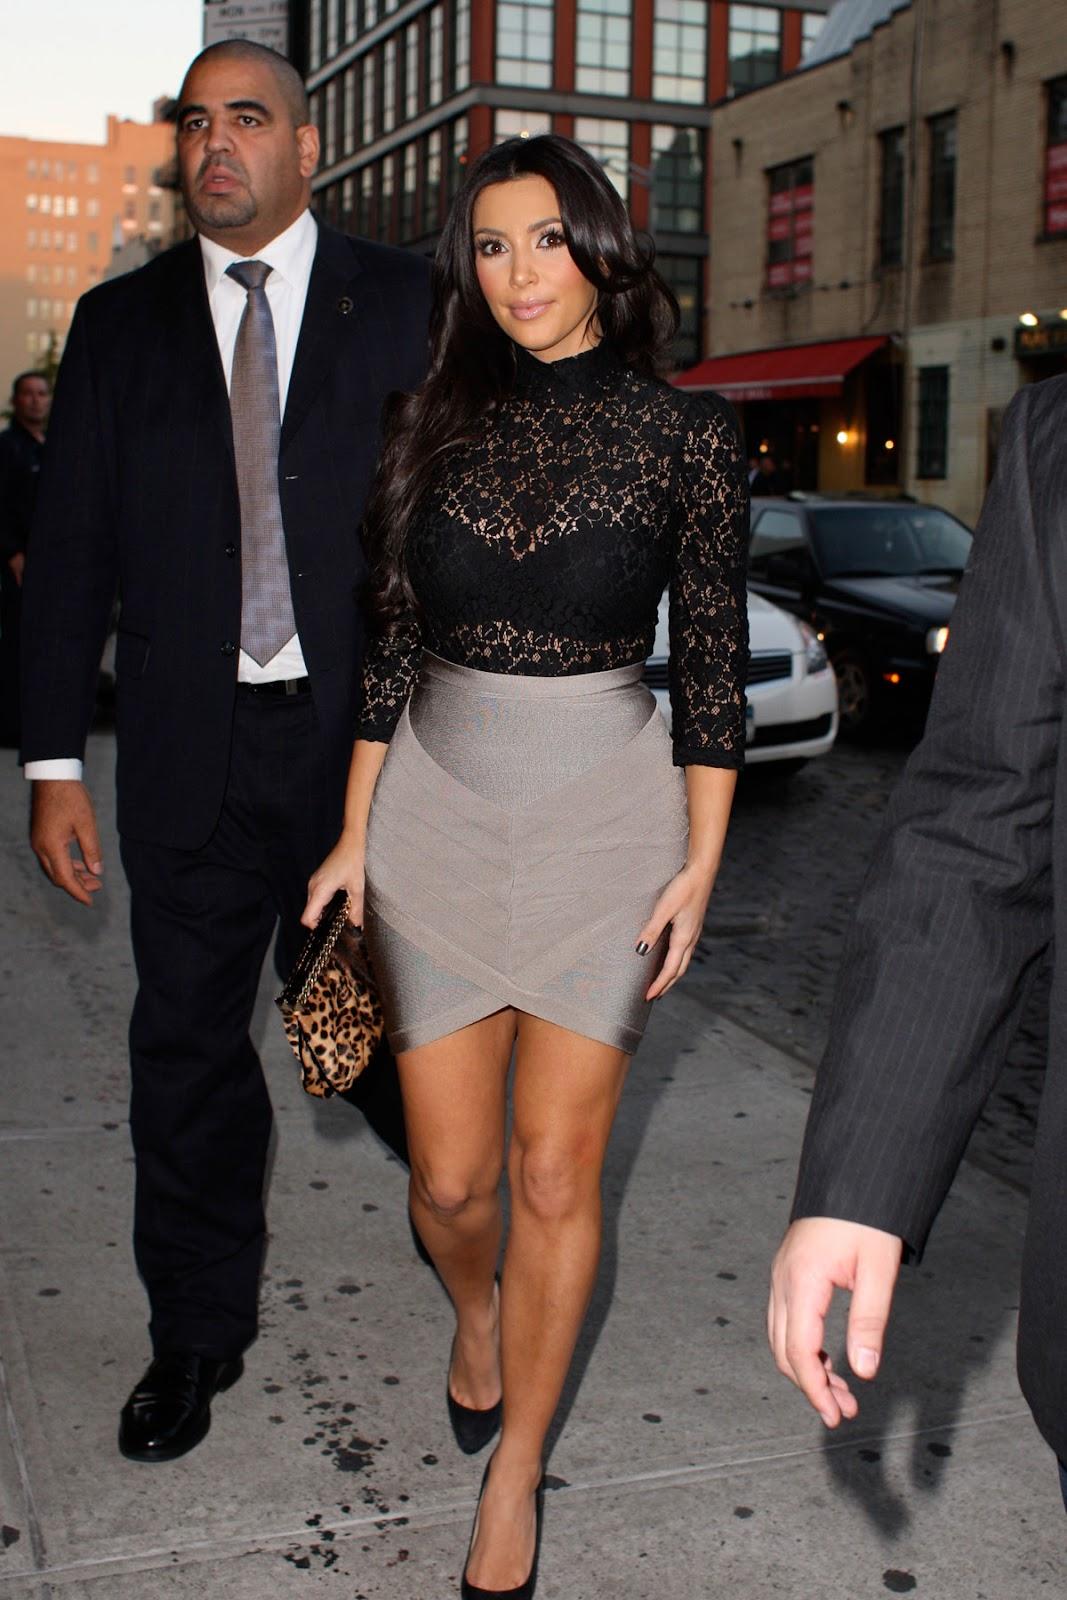 http://4.bp.blogspot.com/-Yn2g3Ju1cJM/TzOX0GY-rKI/AAAAAAAAJYE/vsYXgd3e3o8/s1600/Kim+Kardashian+see+through+hot+coolaristo+21.jpg